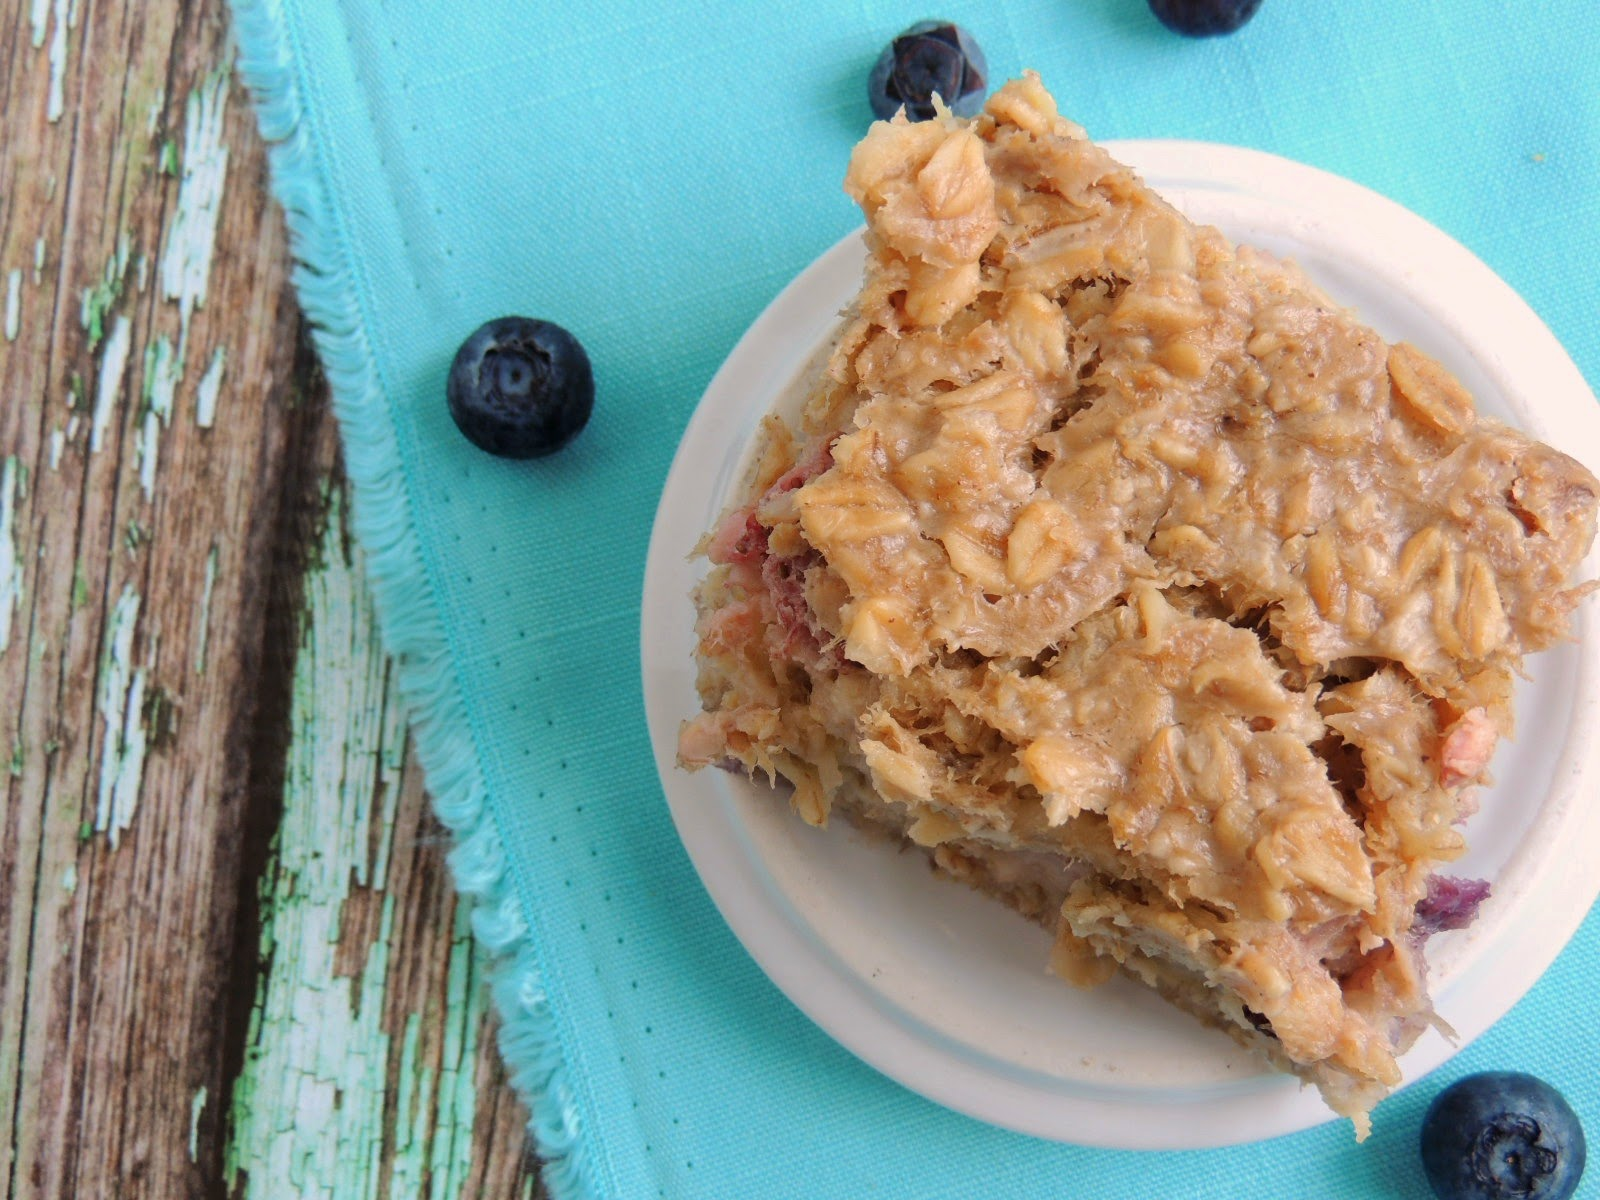 Double Berry Banana Bread Baked Oatmeal via thefrugalfoodiemama.com #eggfree